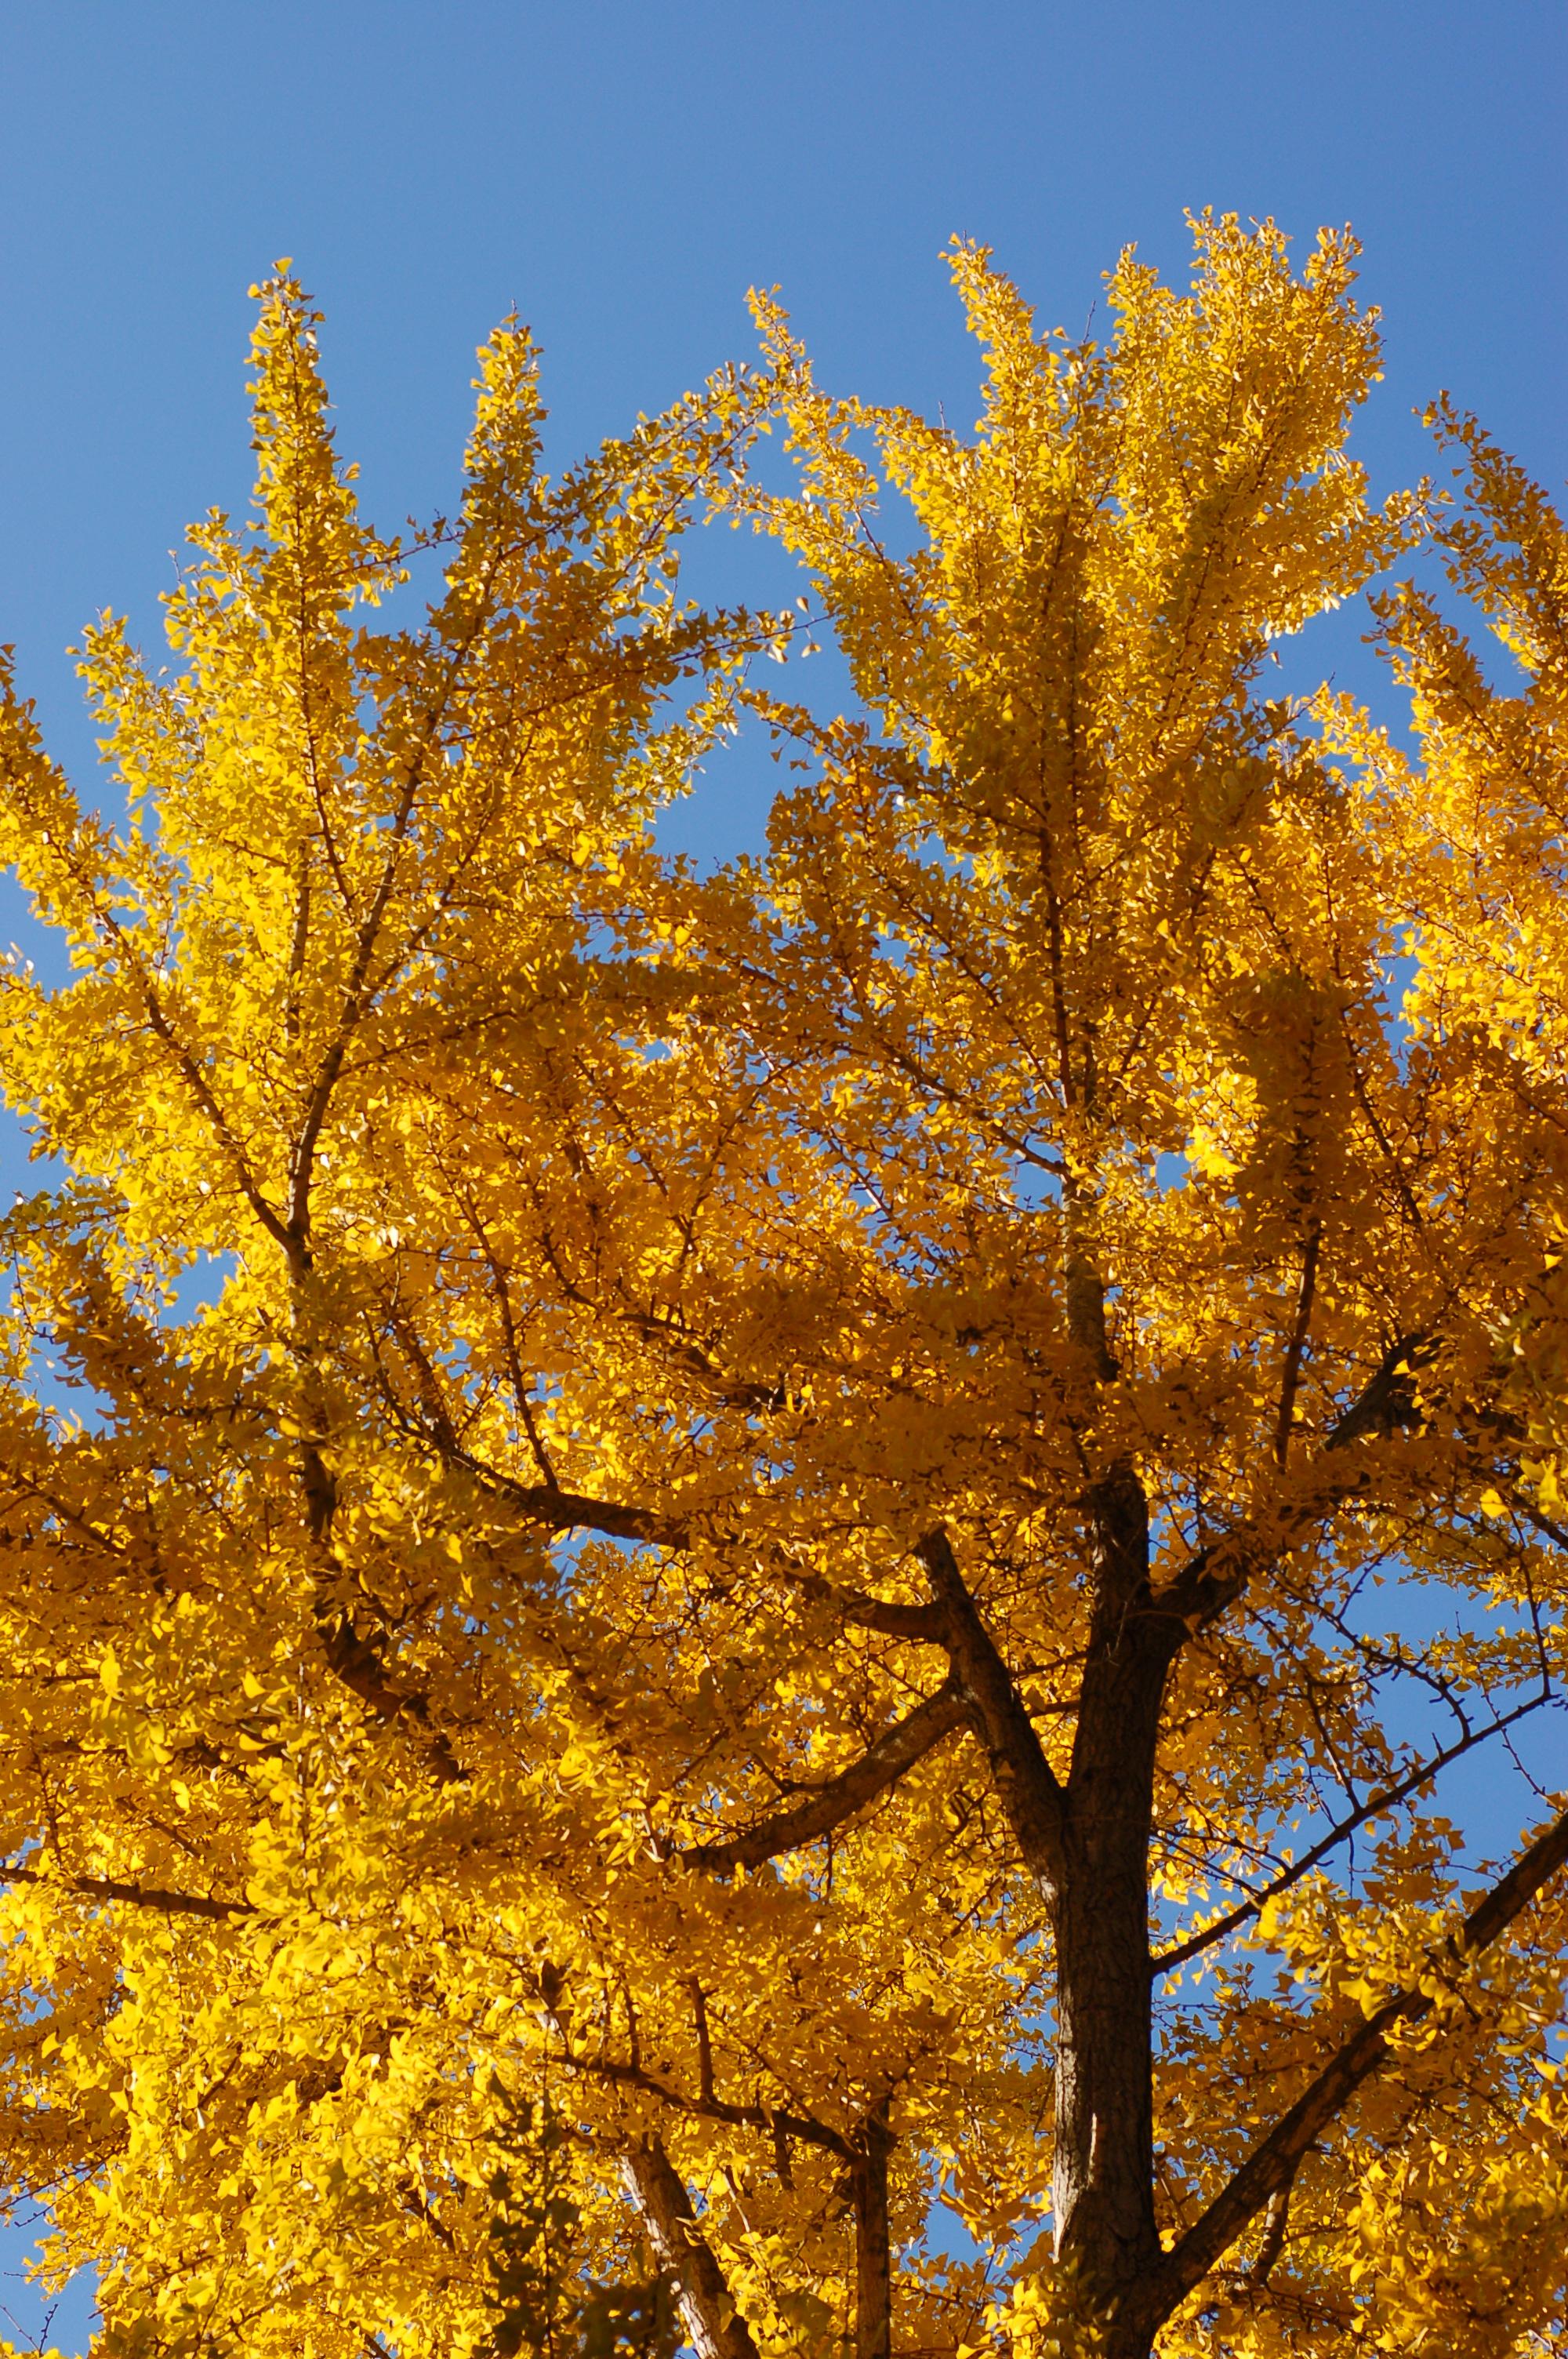 the ginkgo tree Ginkgo, maidenhair tree categories: poisonous plants, trees  ginkgo biloba bark and foliage annette wang, cc by-nc-20 ginkgo biloba form ginkgo cz, cc by - 20.